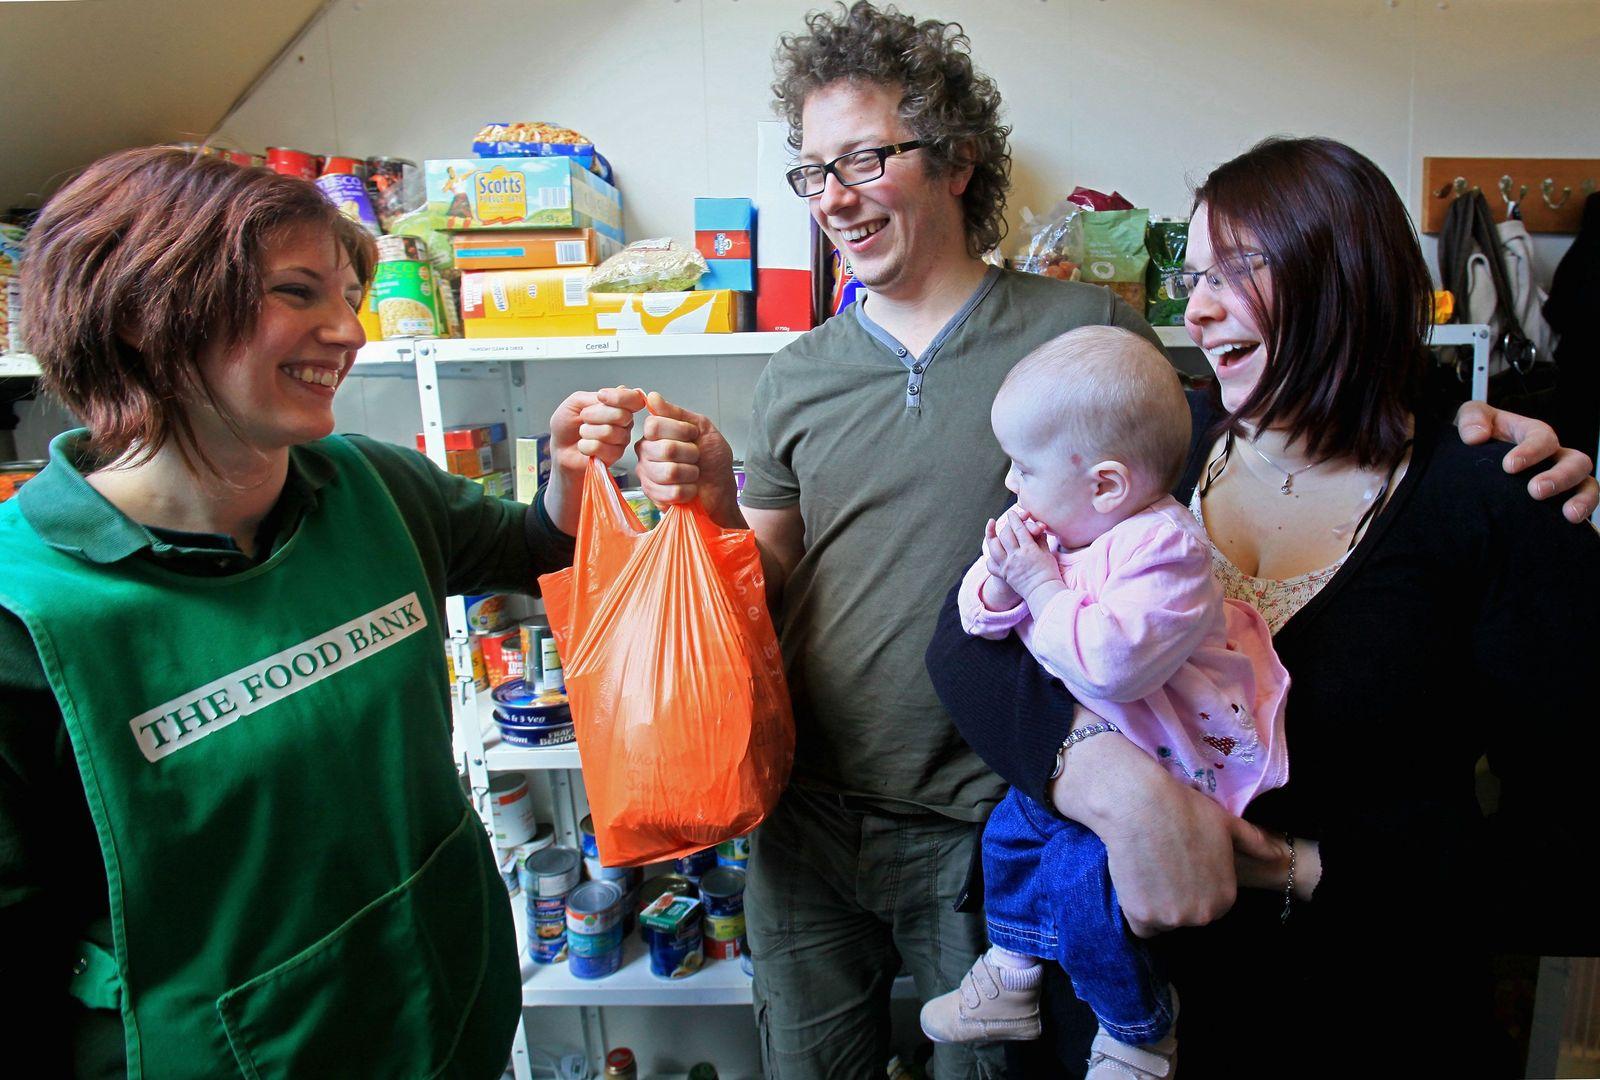 England / Armut / Lebensmittel-Spende